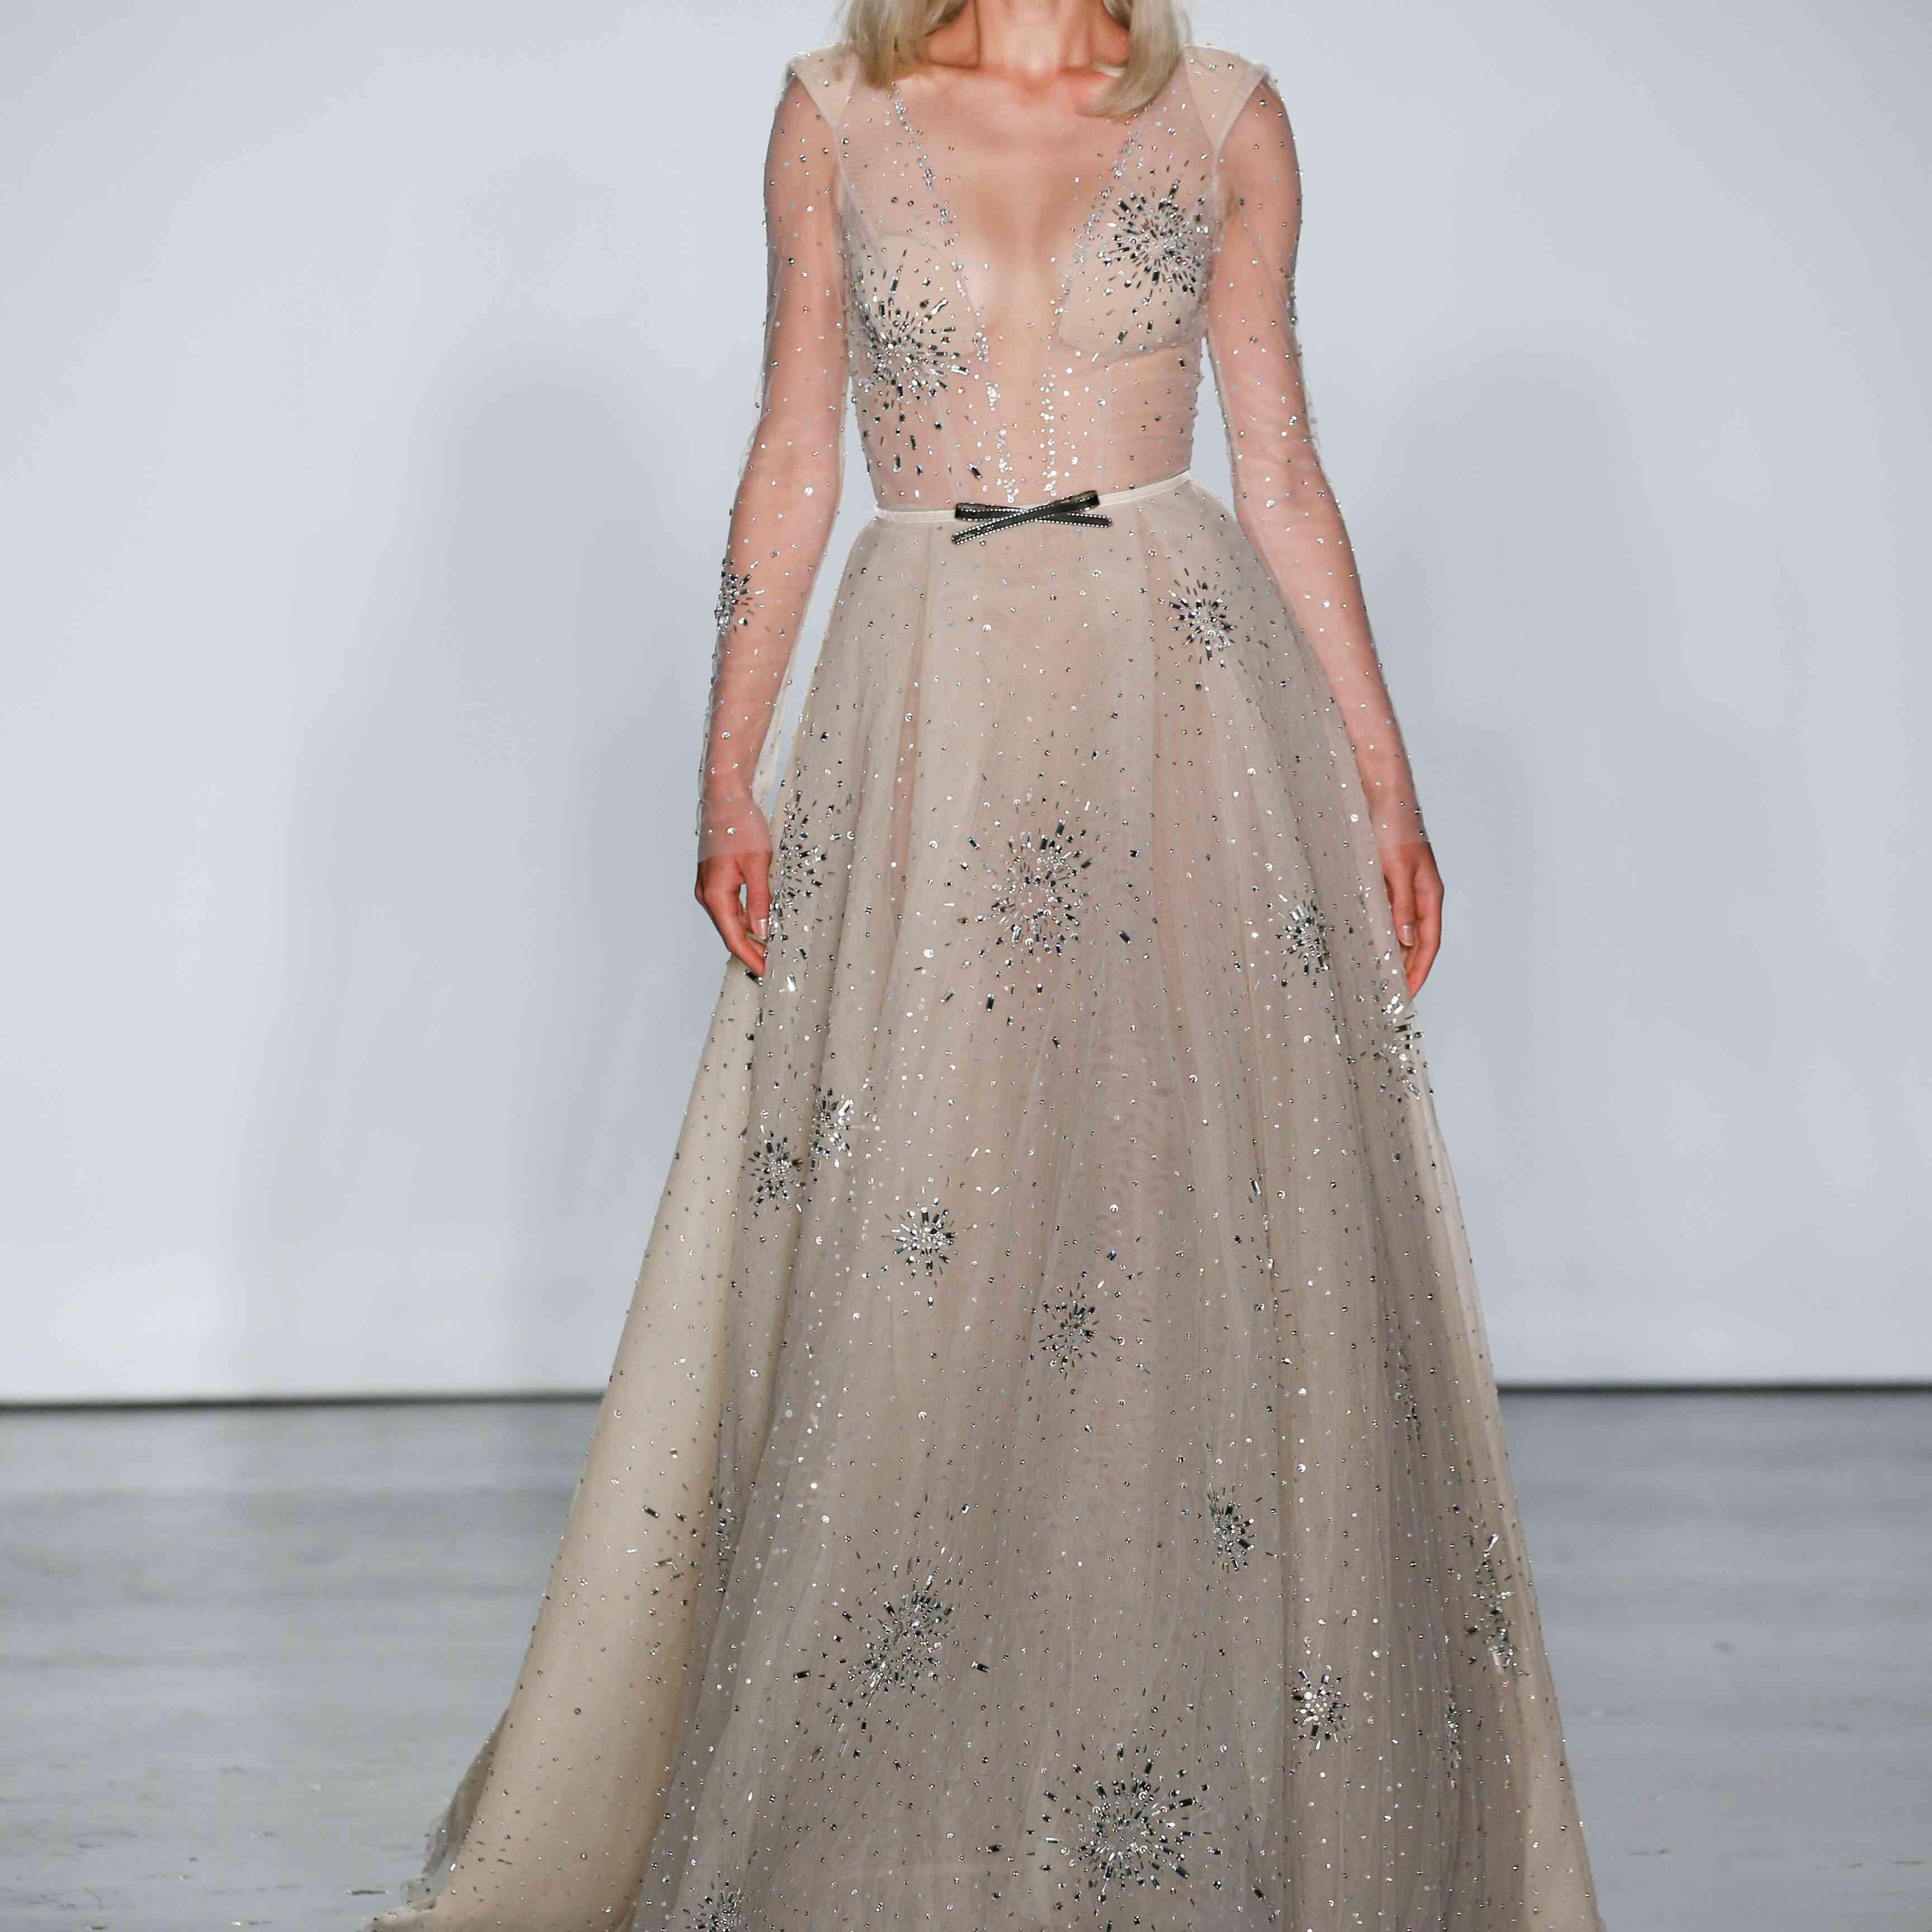 Model in long sleeve wedding ball gown